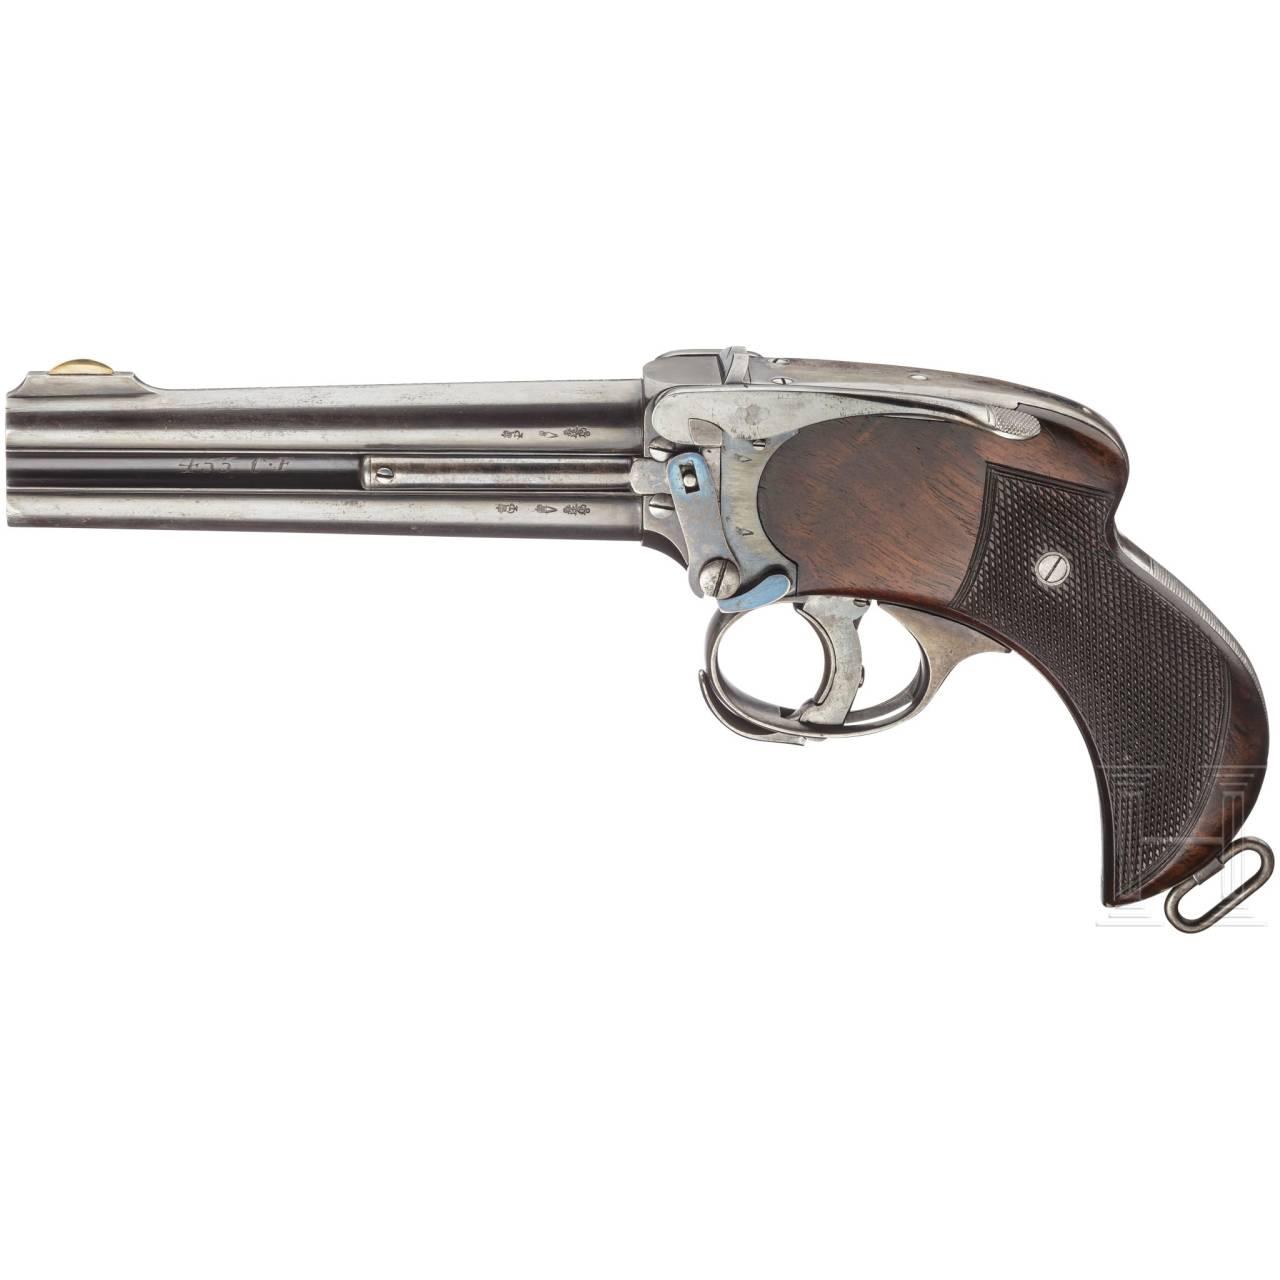 Zweiläufige Pistole Lancaster (Howdah), um 1896